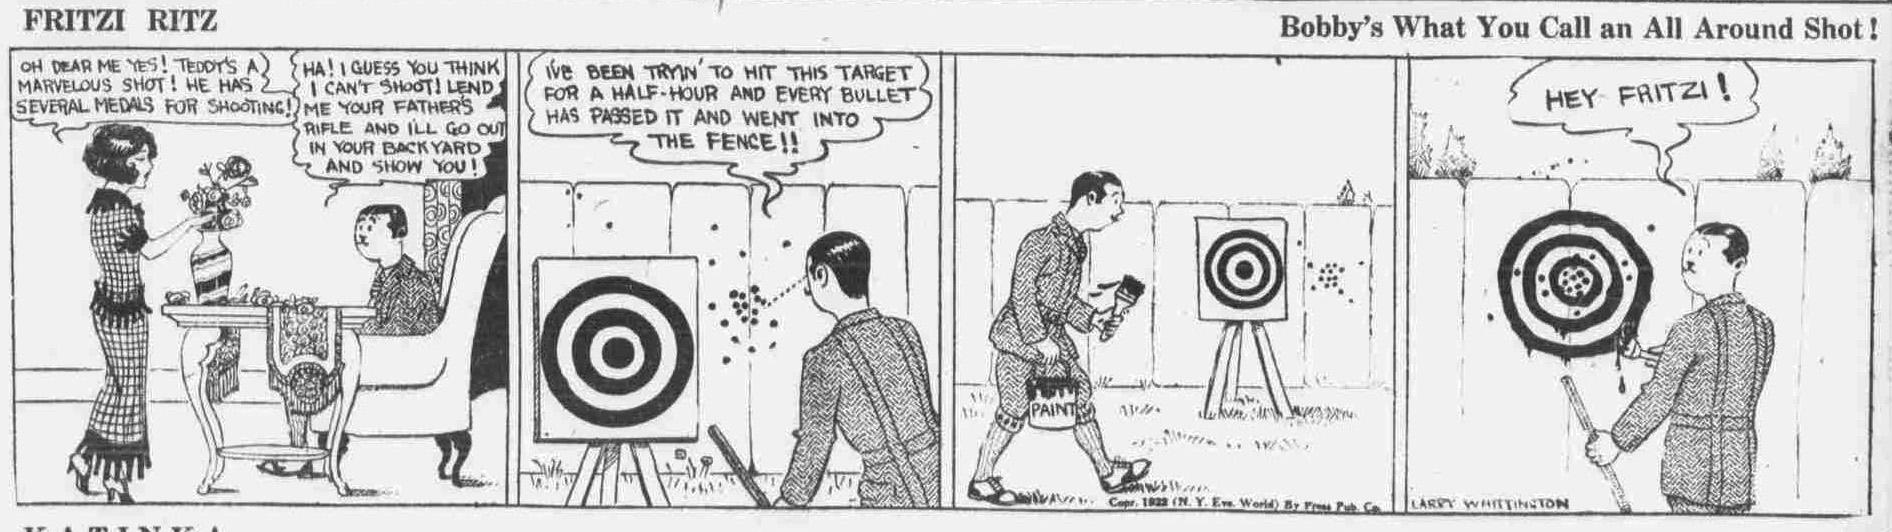 Dec. 6, 1922